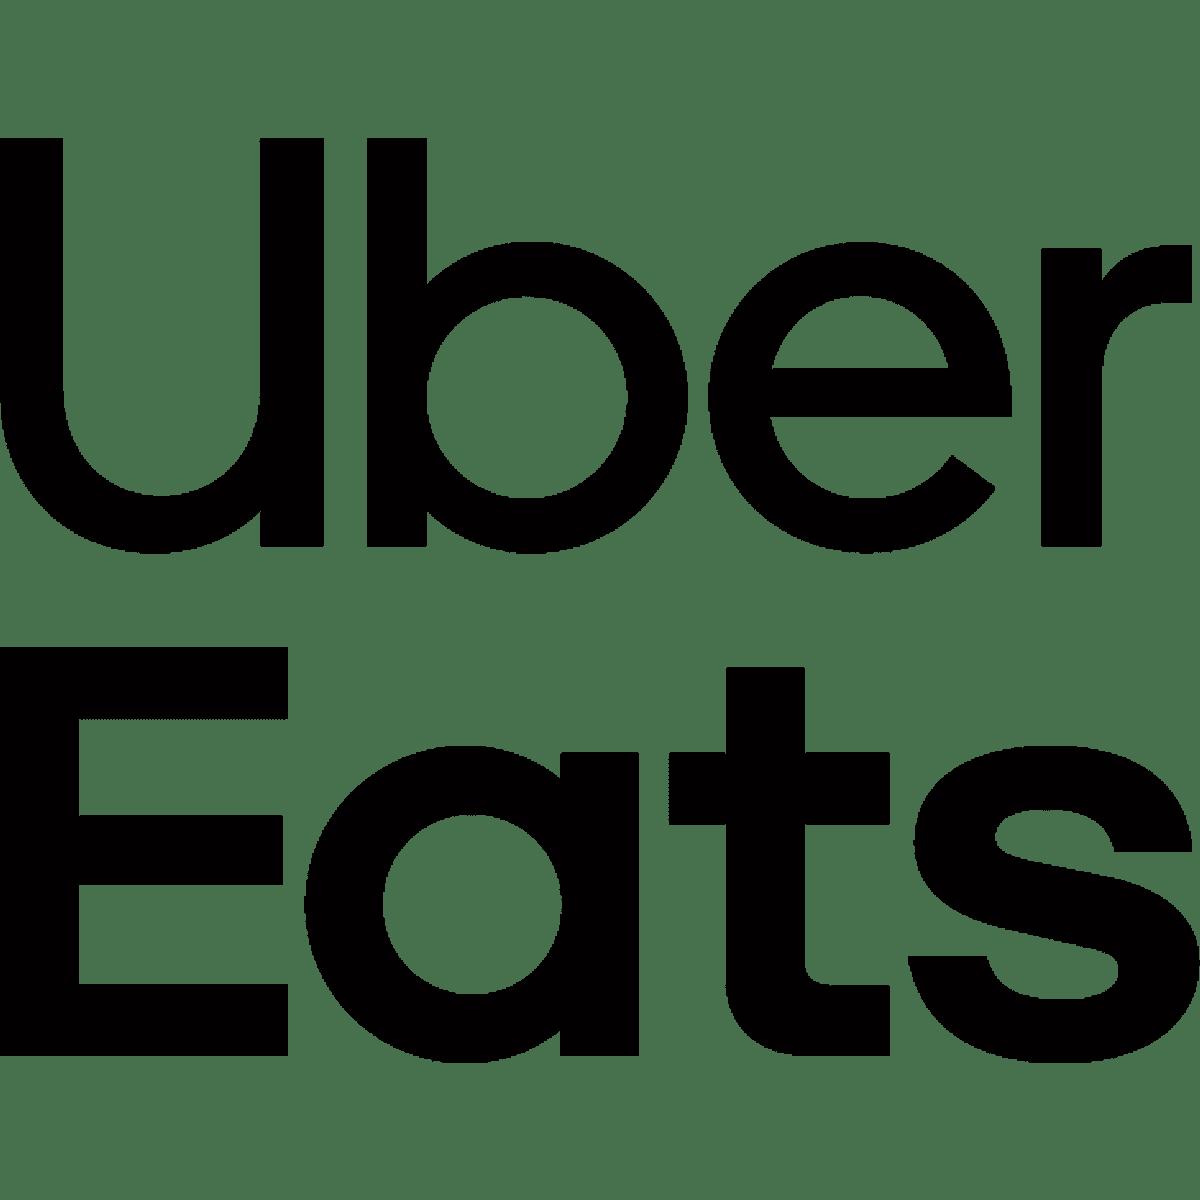 UberEats logo.